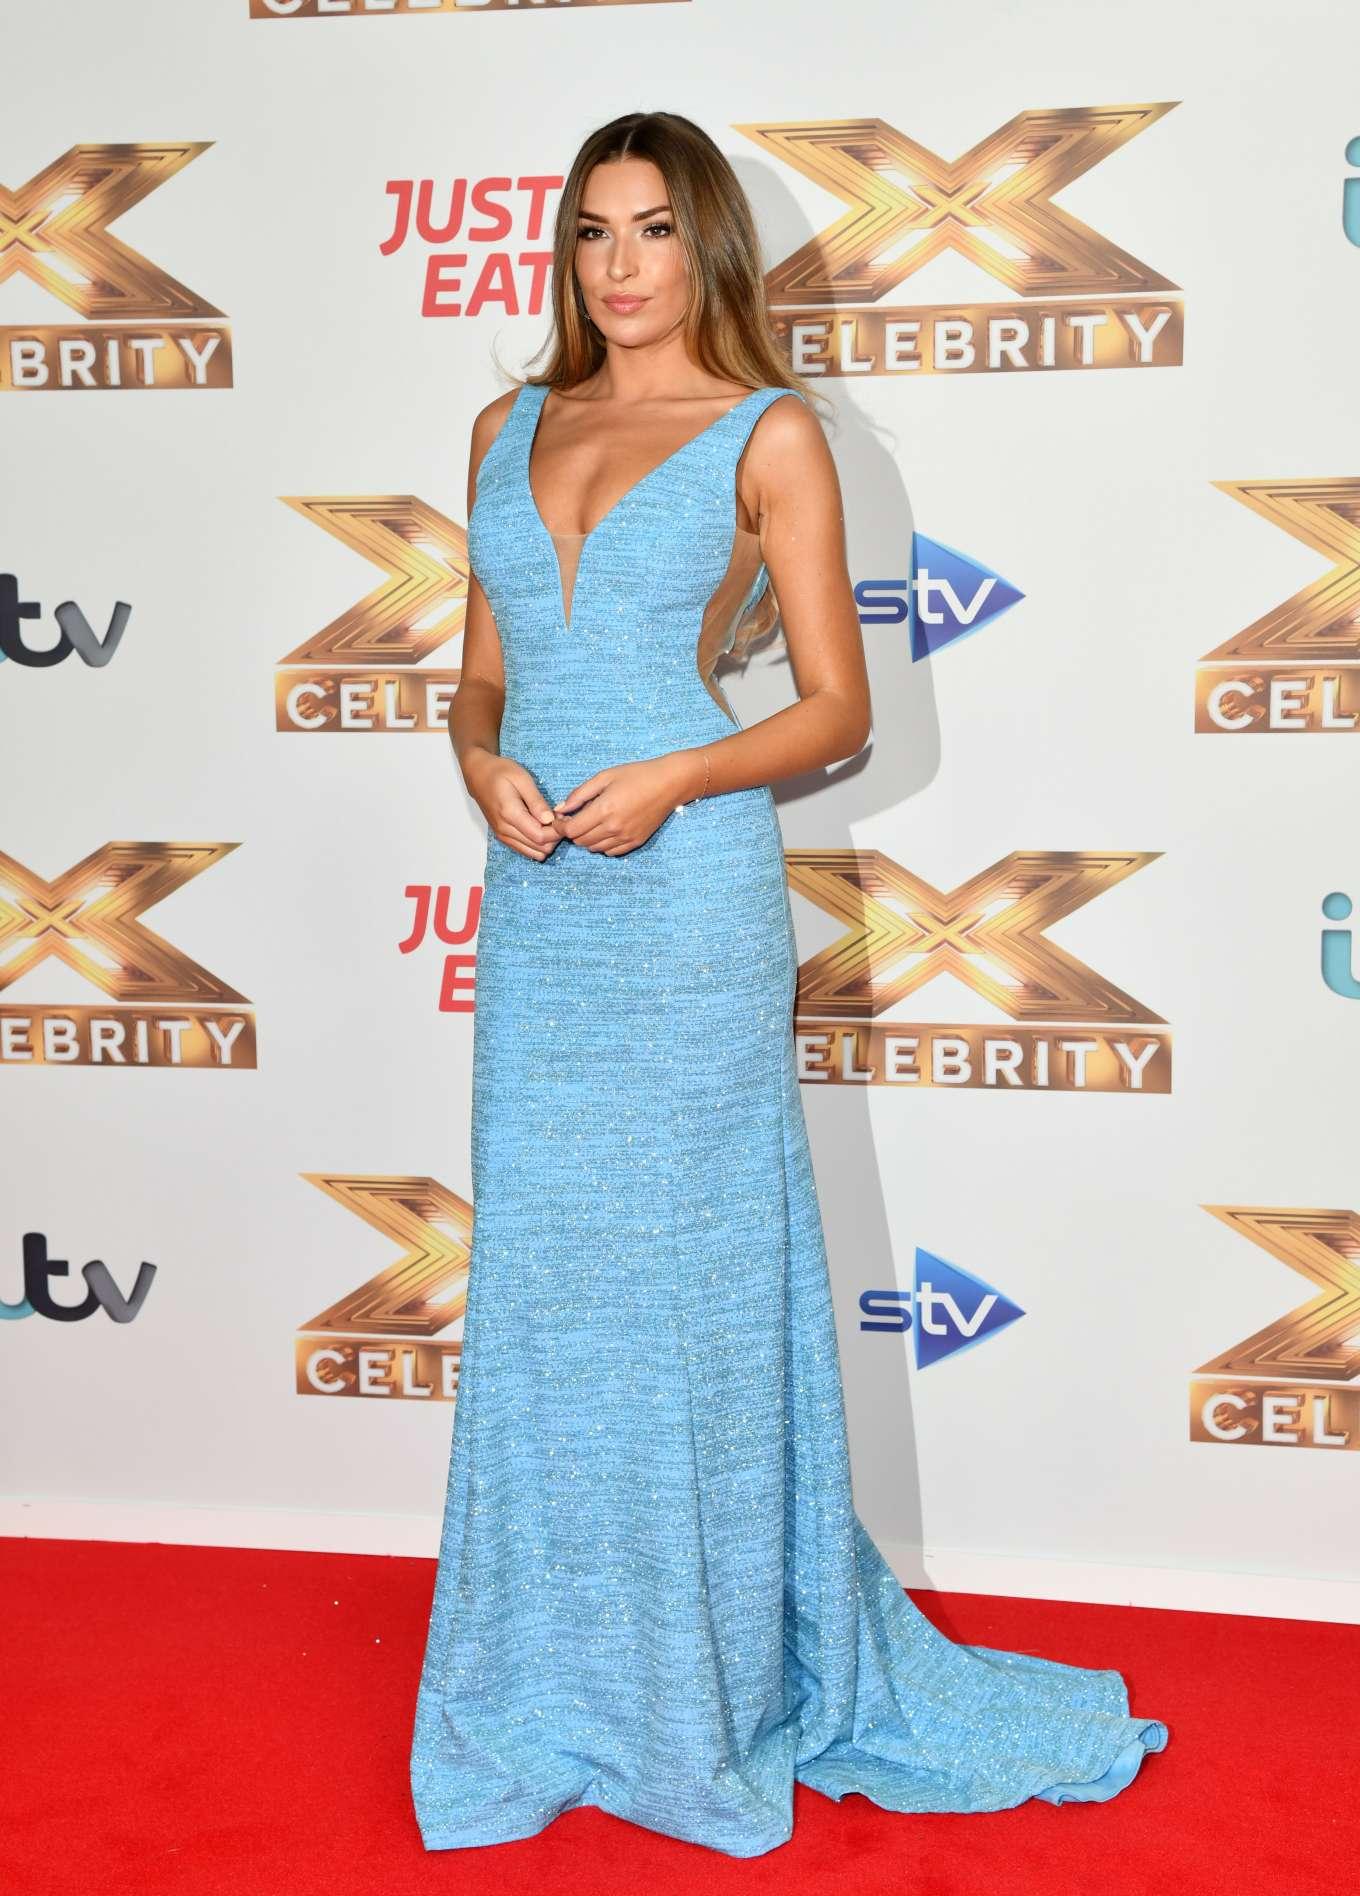 Zara McDermott 2019 : Zara McDermott – X Factor Celebrity Photocall-06